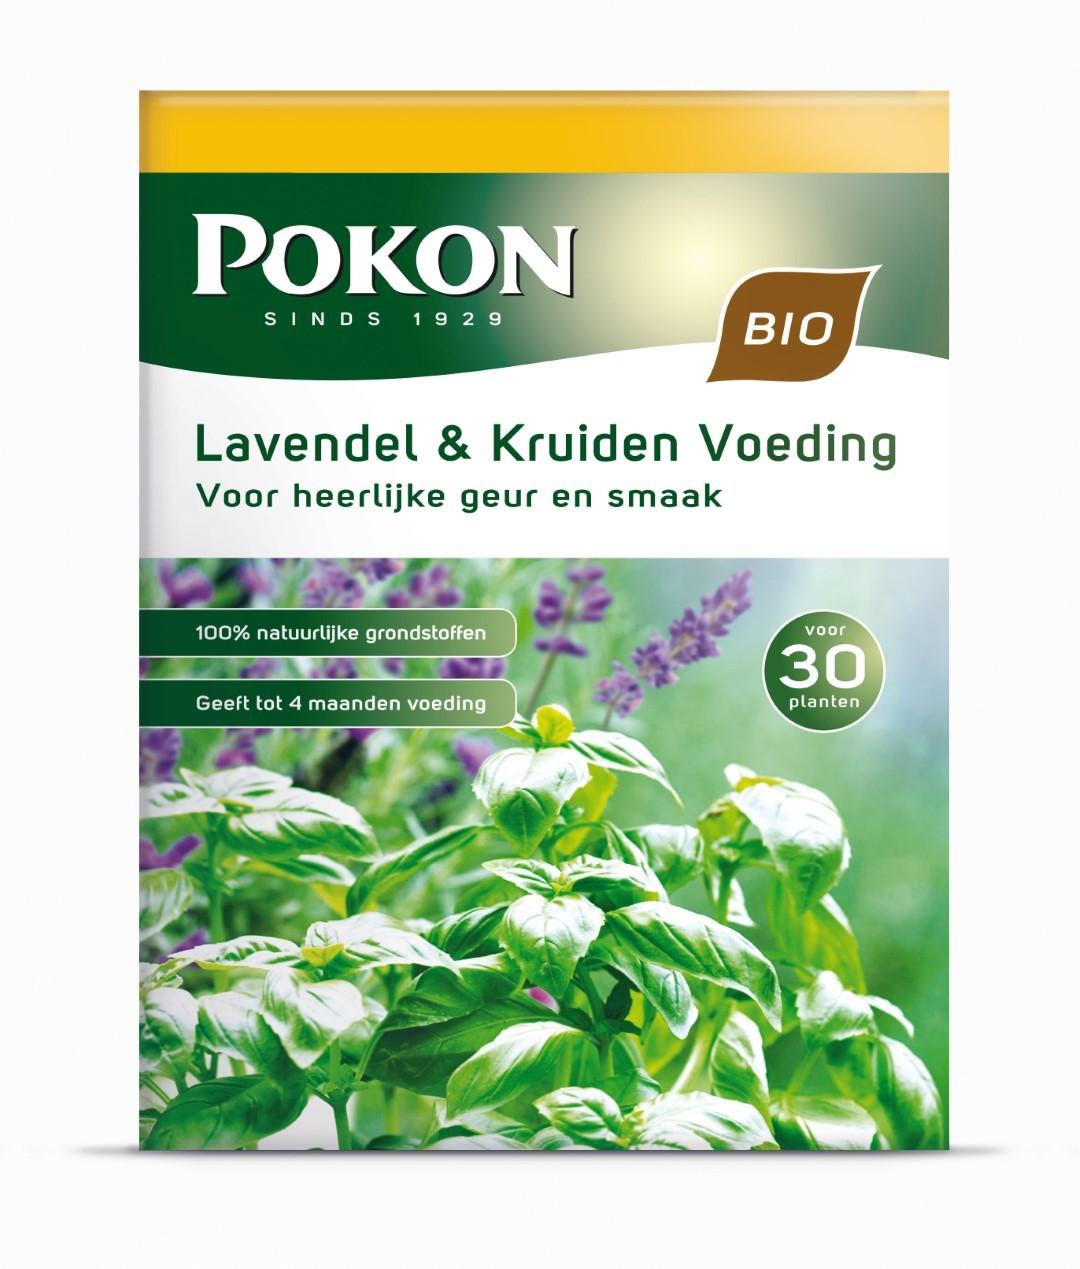 Lavendel & Kruiden Voeding 1kg